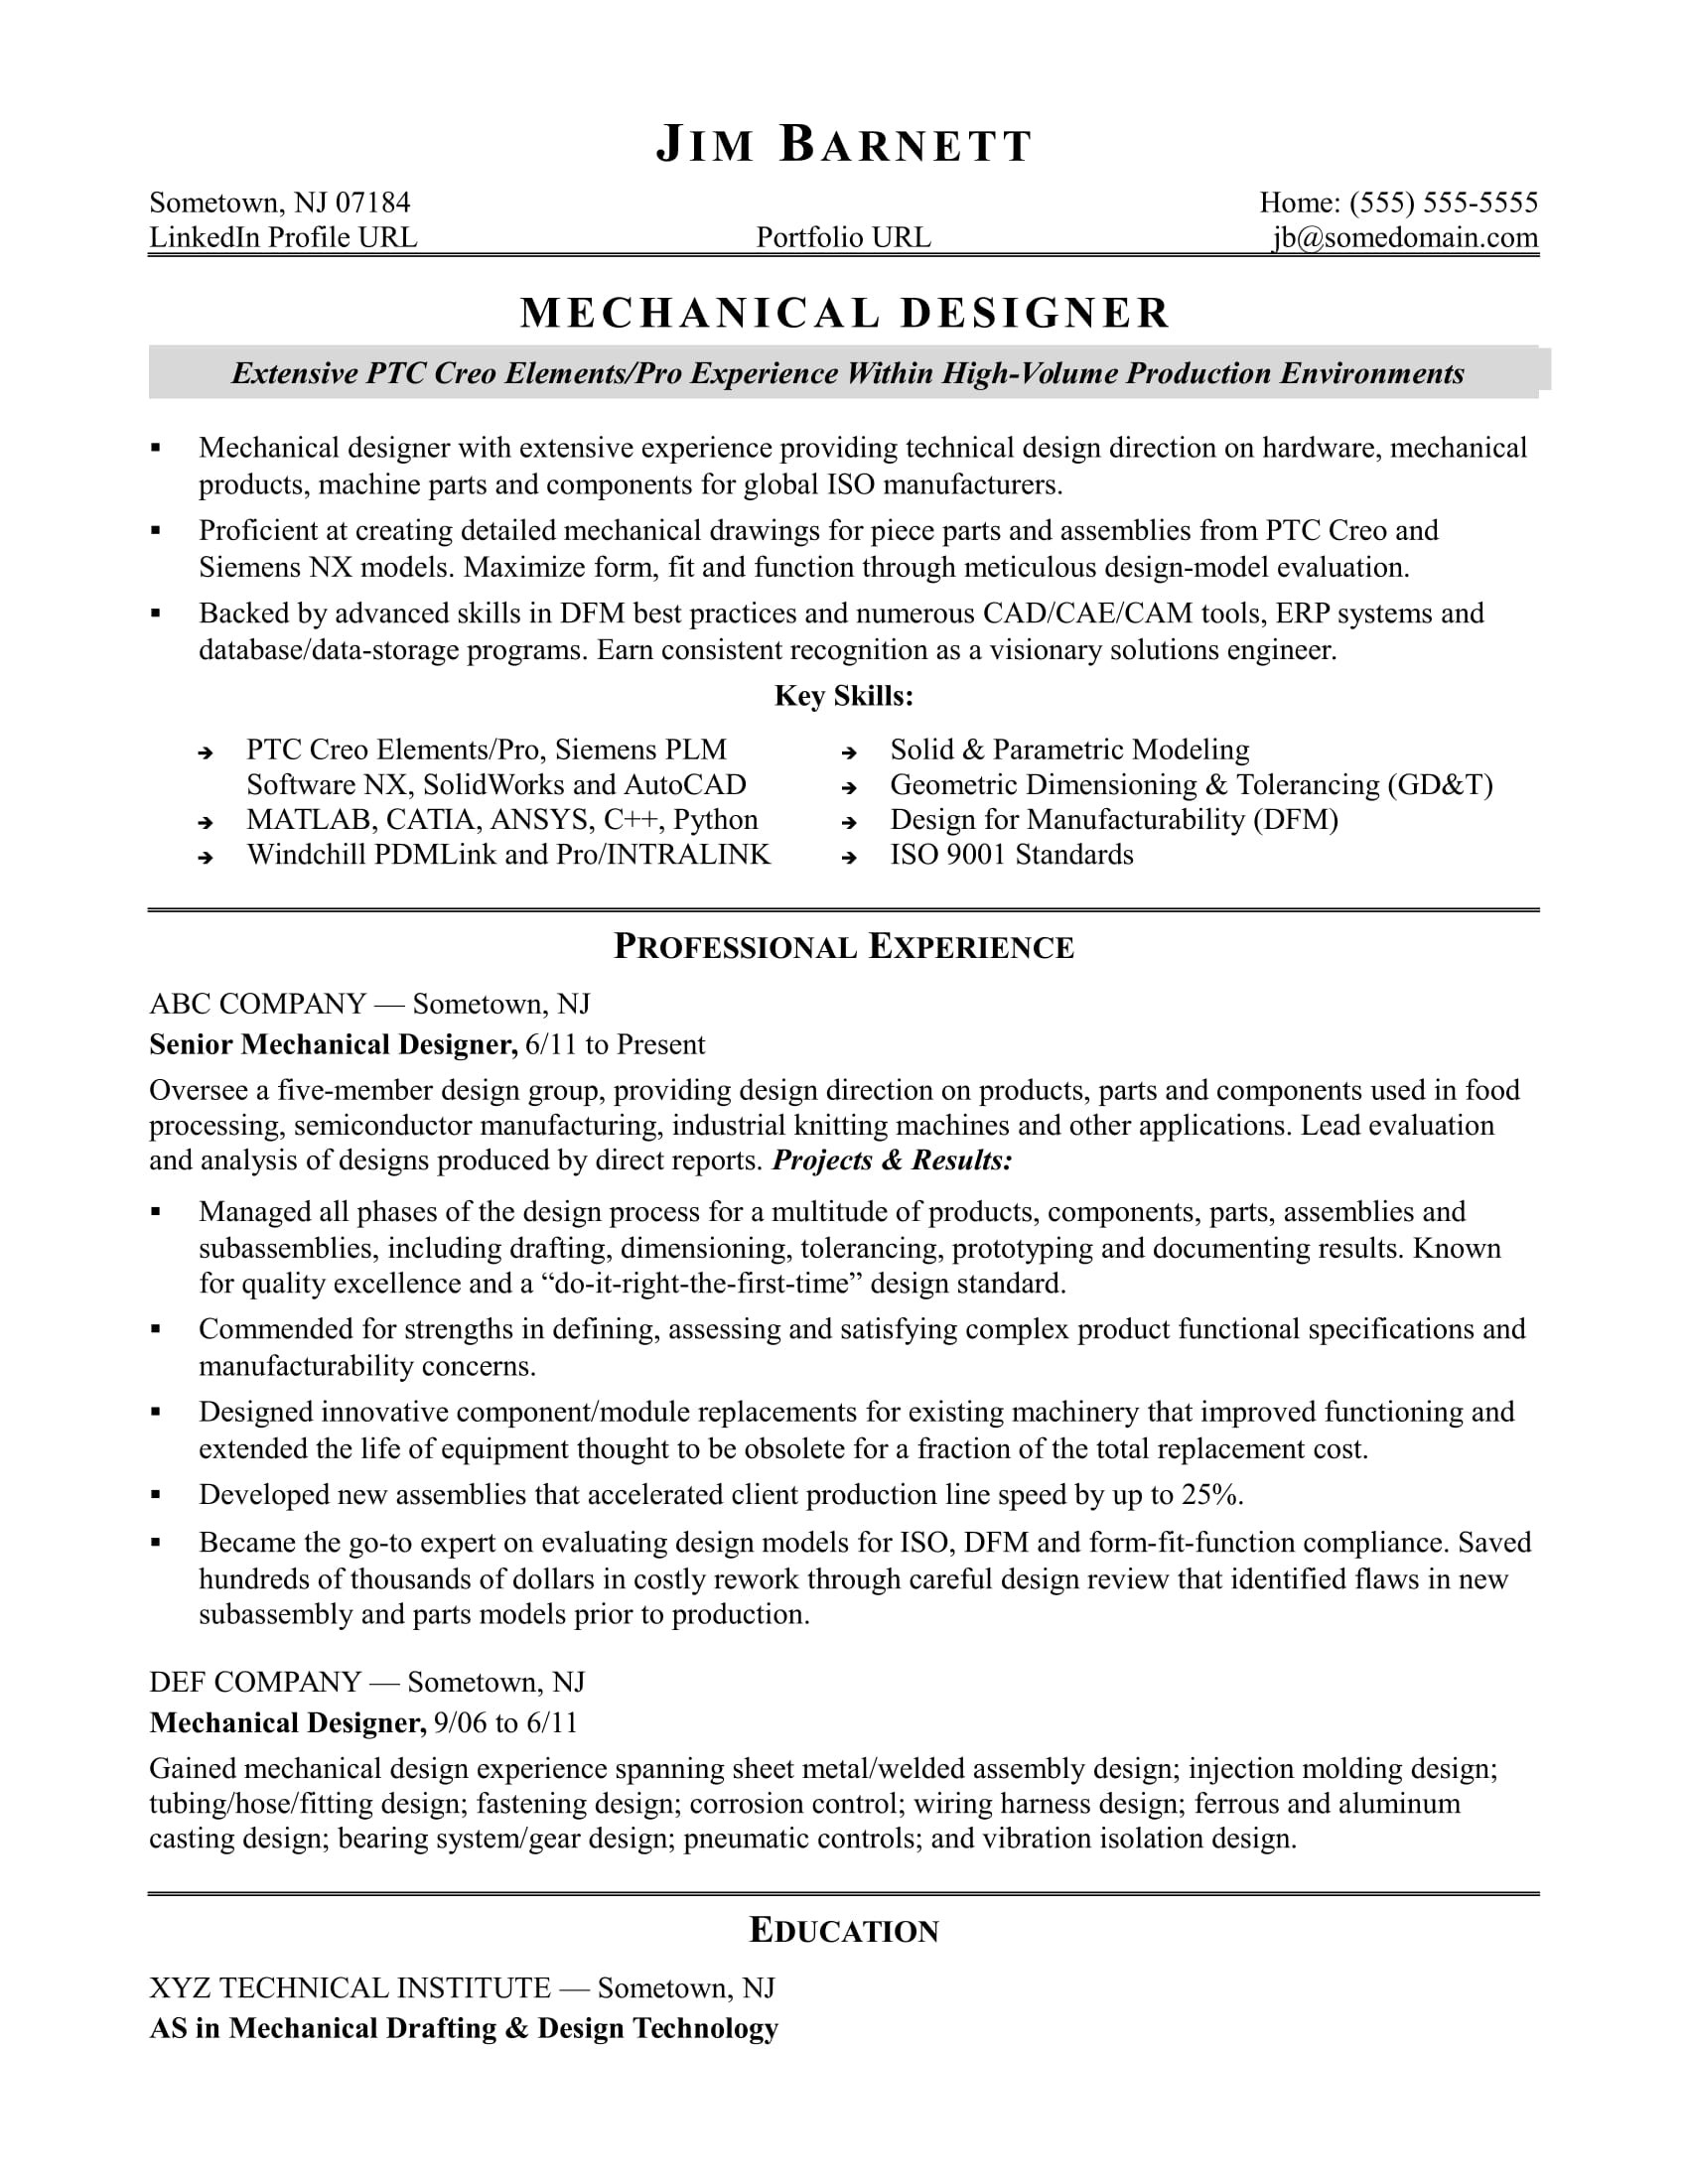 sample resume mechanical designer experienced